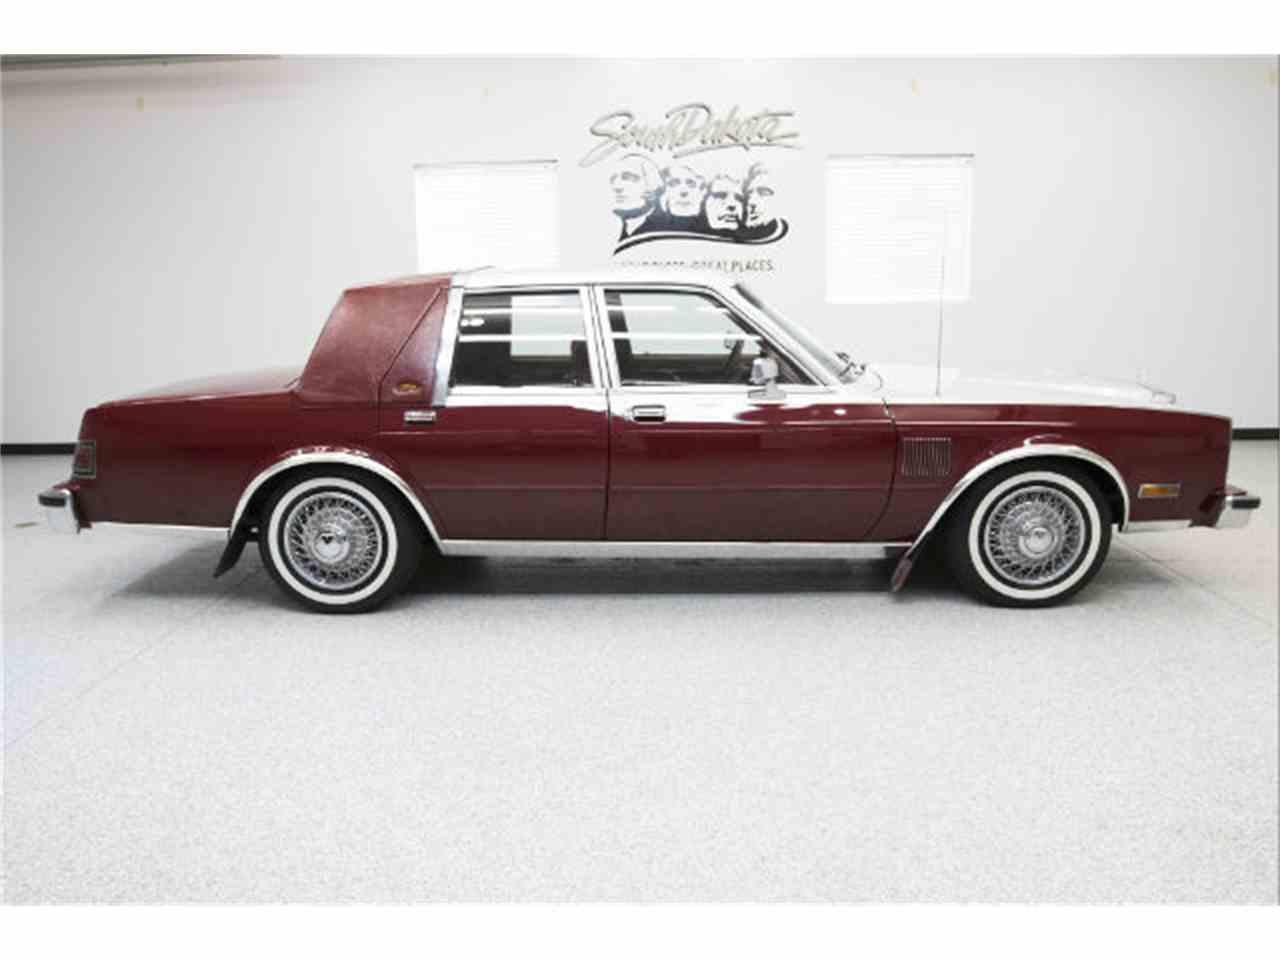 1986 Chrysler Fifth Avenue for Sale - CC-1046735